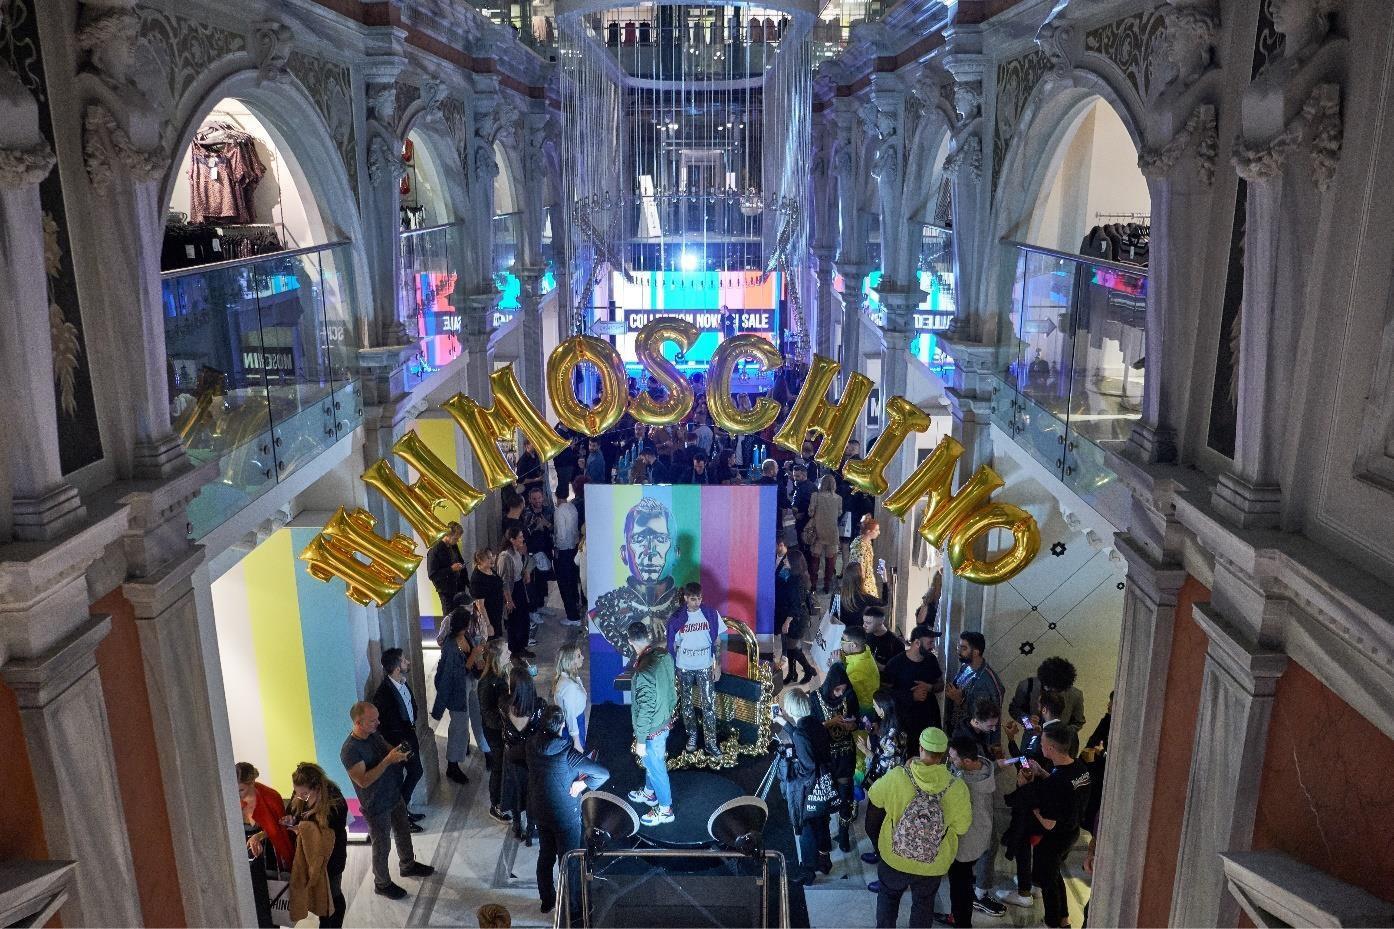 90s glam στο exclusive party για την παρουσίαση της συλλογής Moschino [tv] H&M